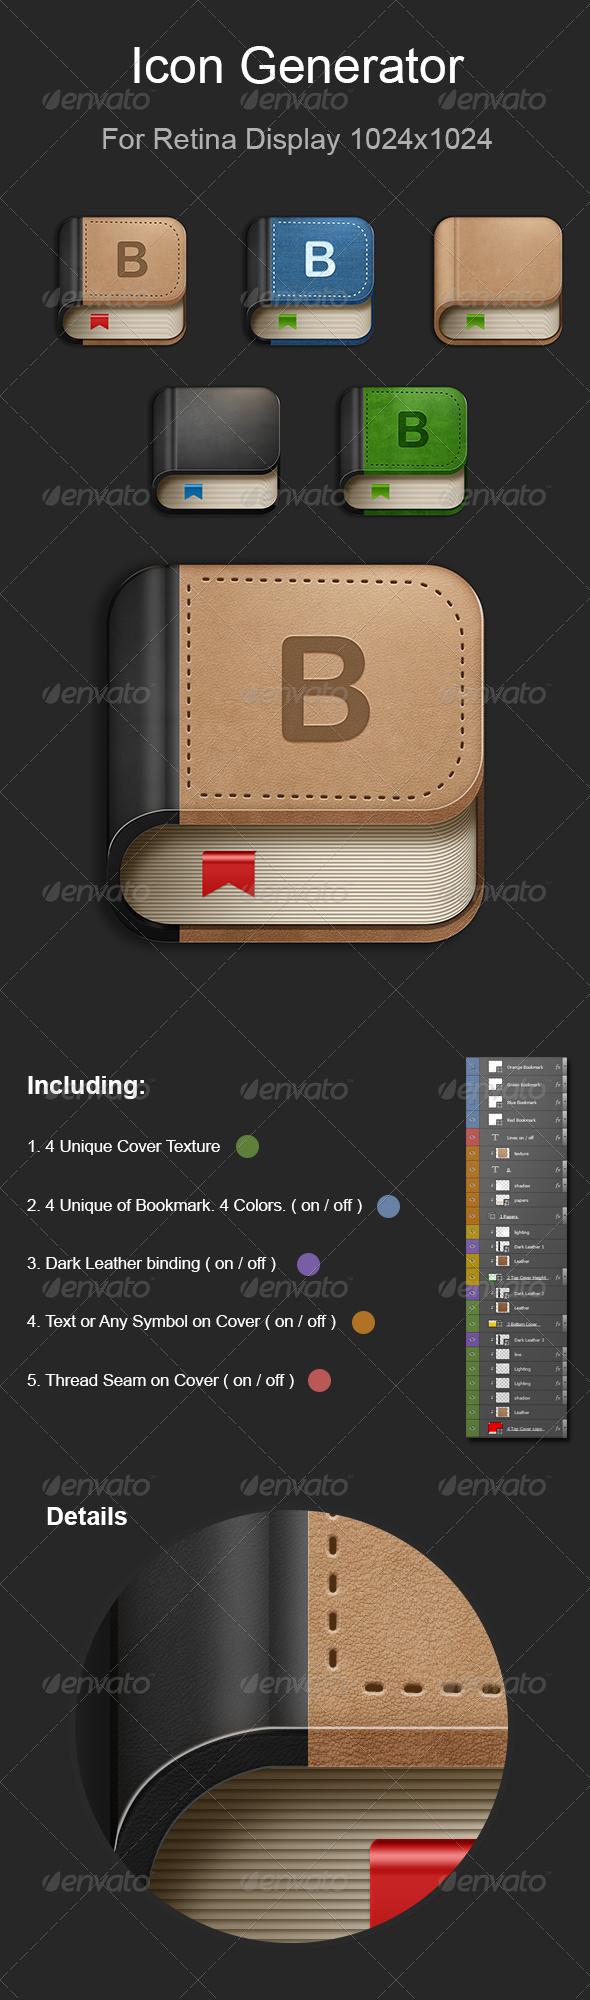 High Quality iOS Retina Book Icon Generator Icon